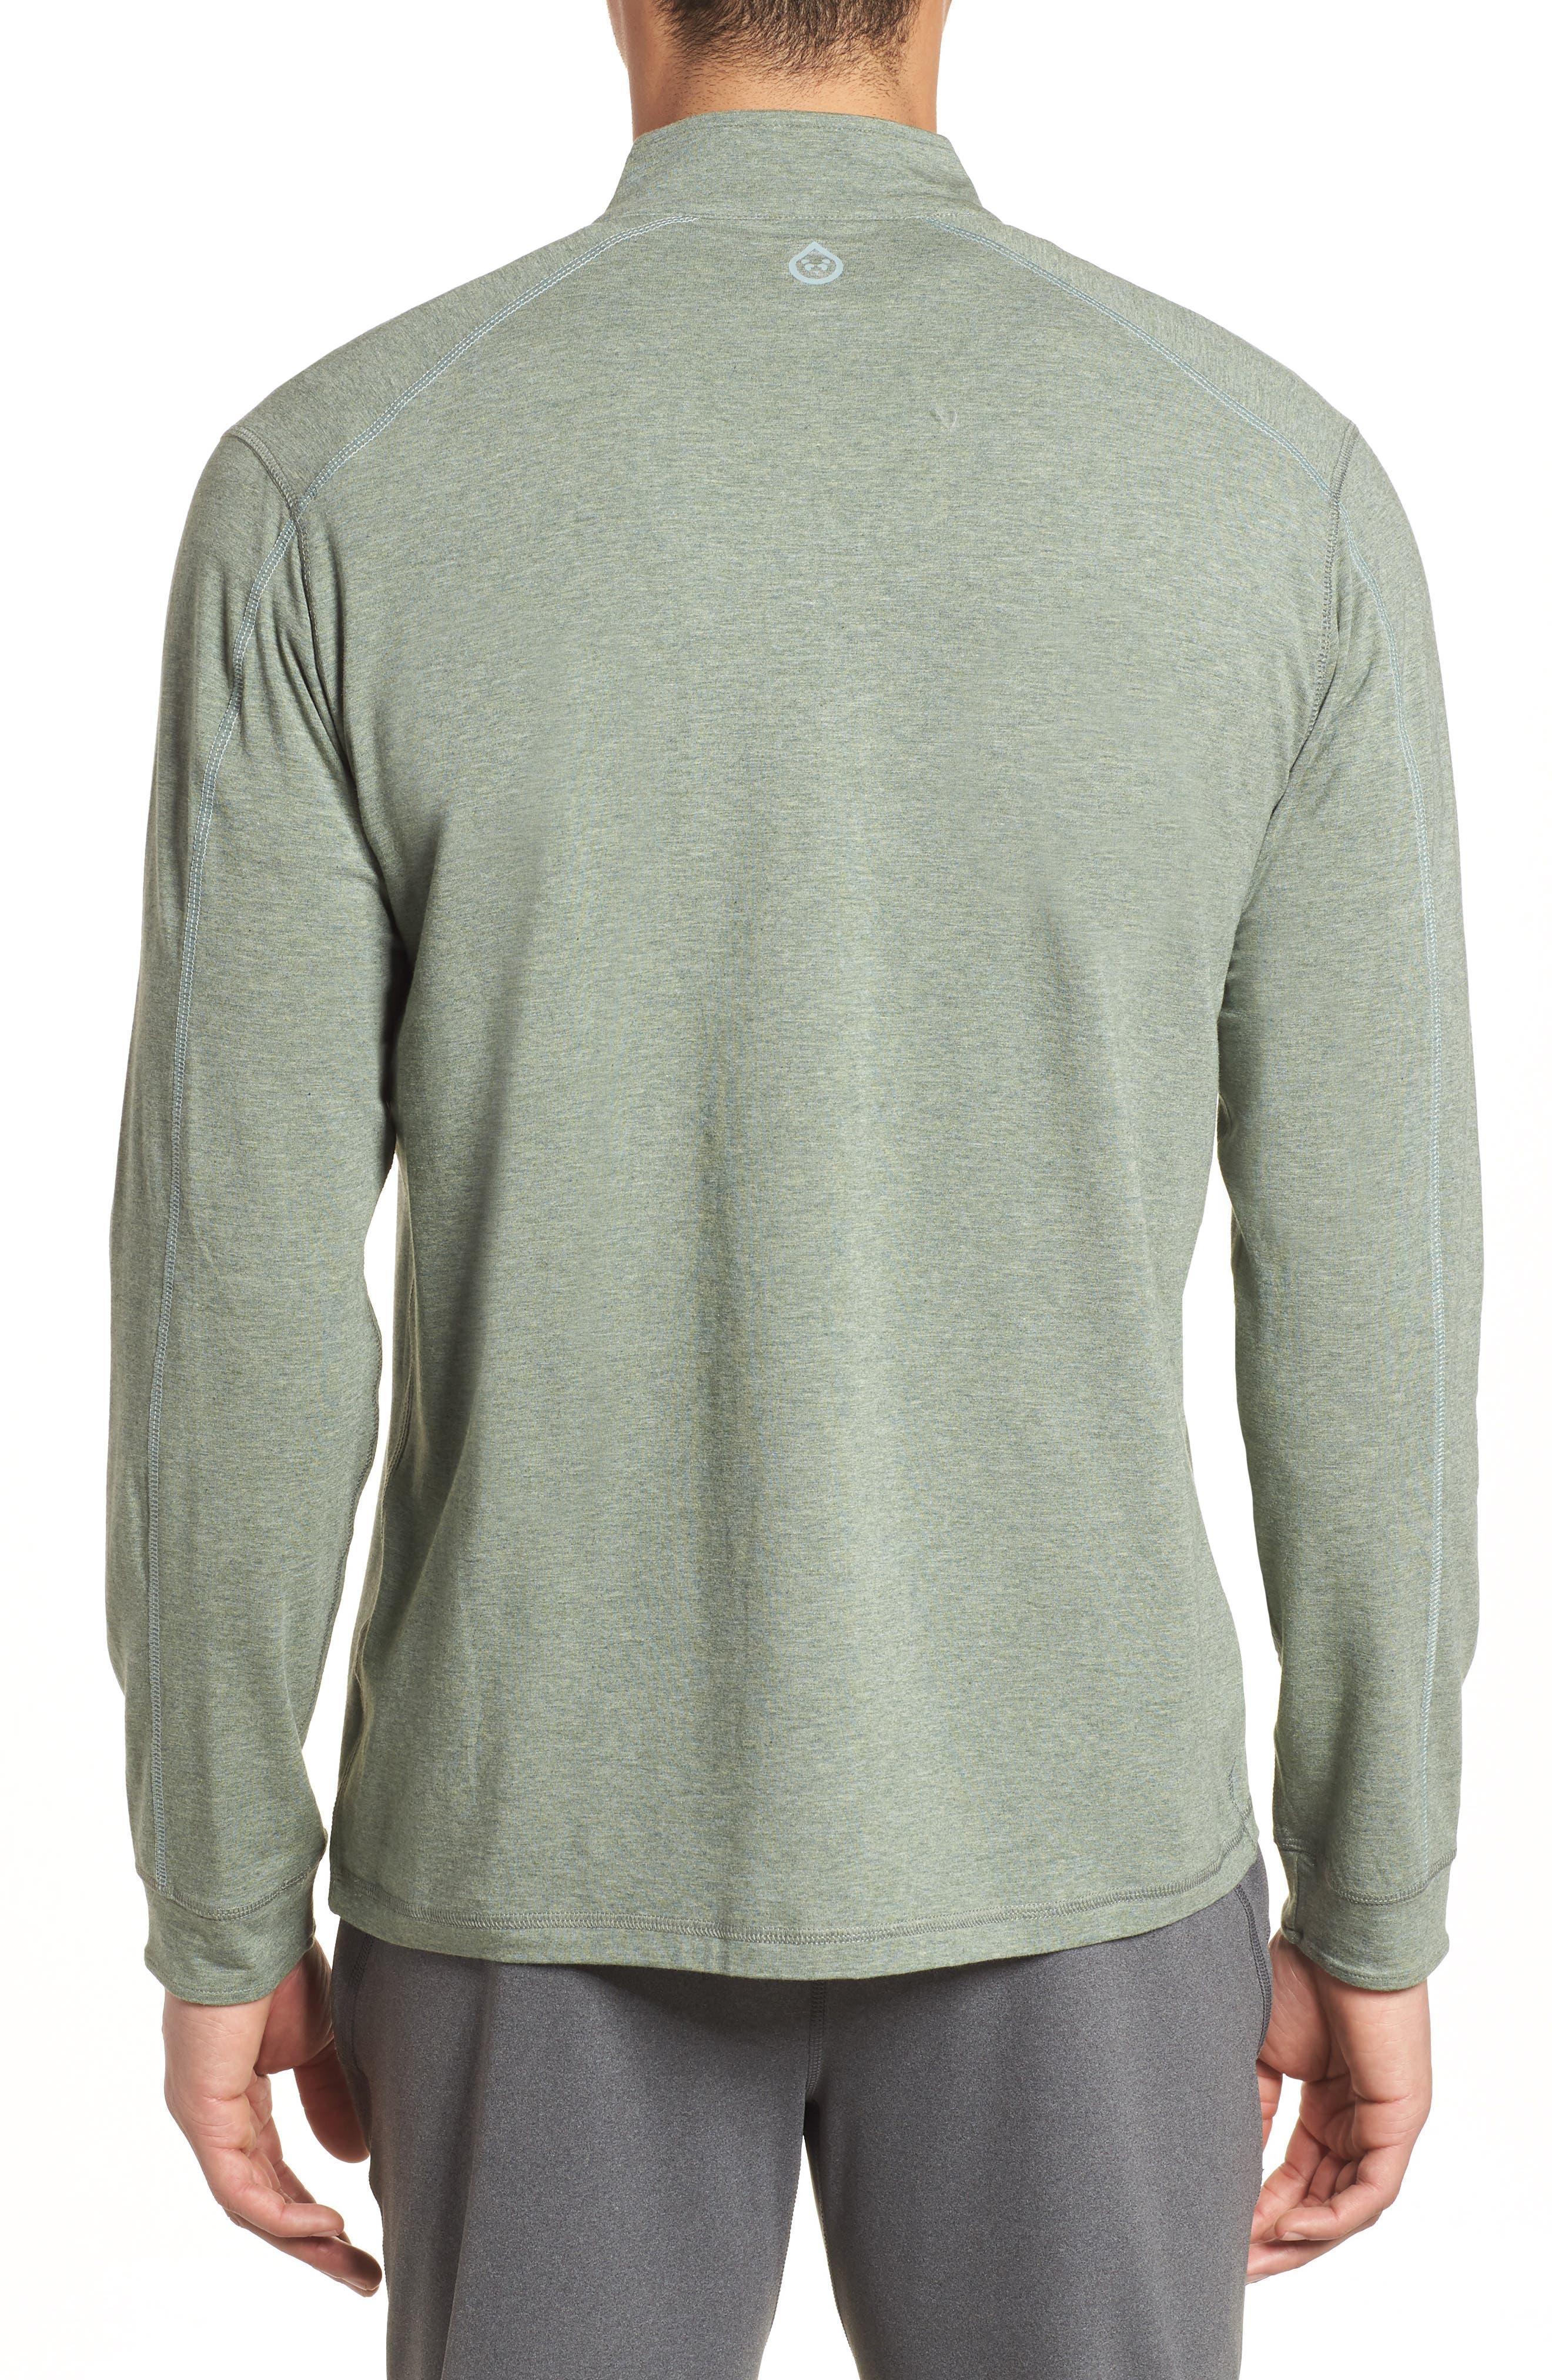 Carrollton Quarter Zip Sweatshirt,                             Alternate thumbnail 2, color,                             Kelp Heather